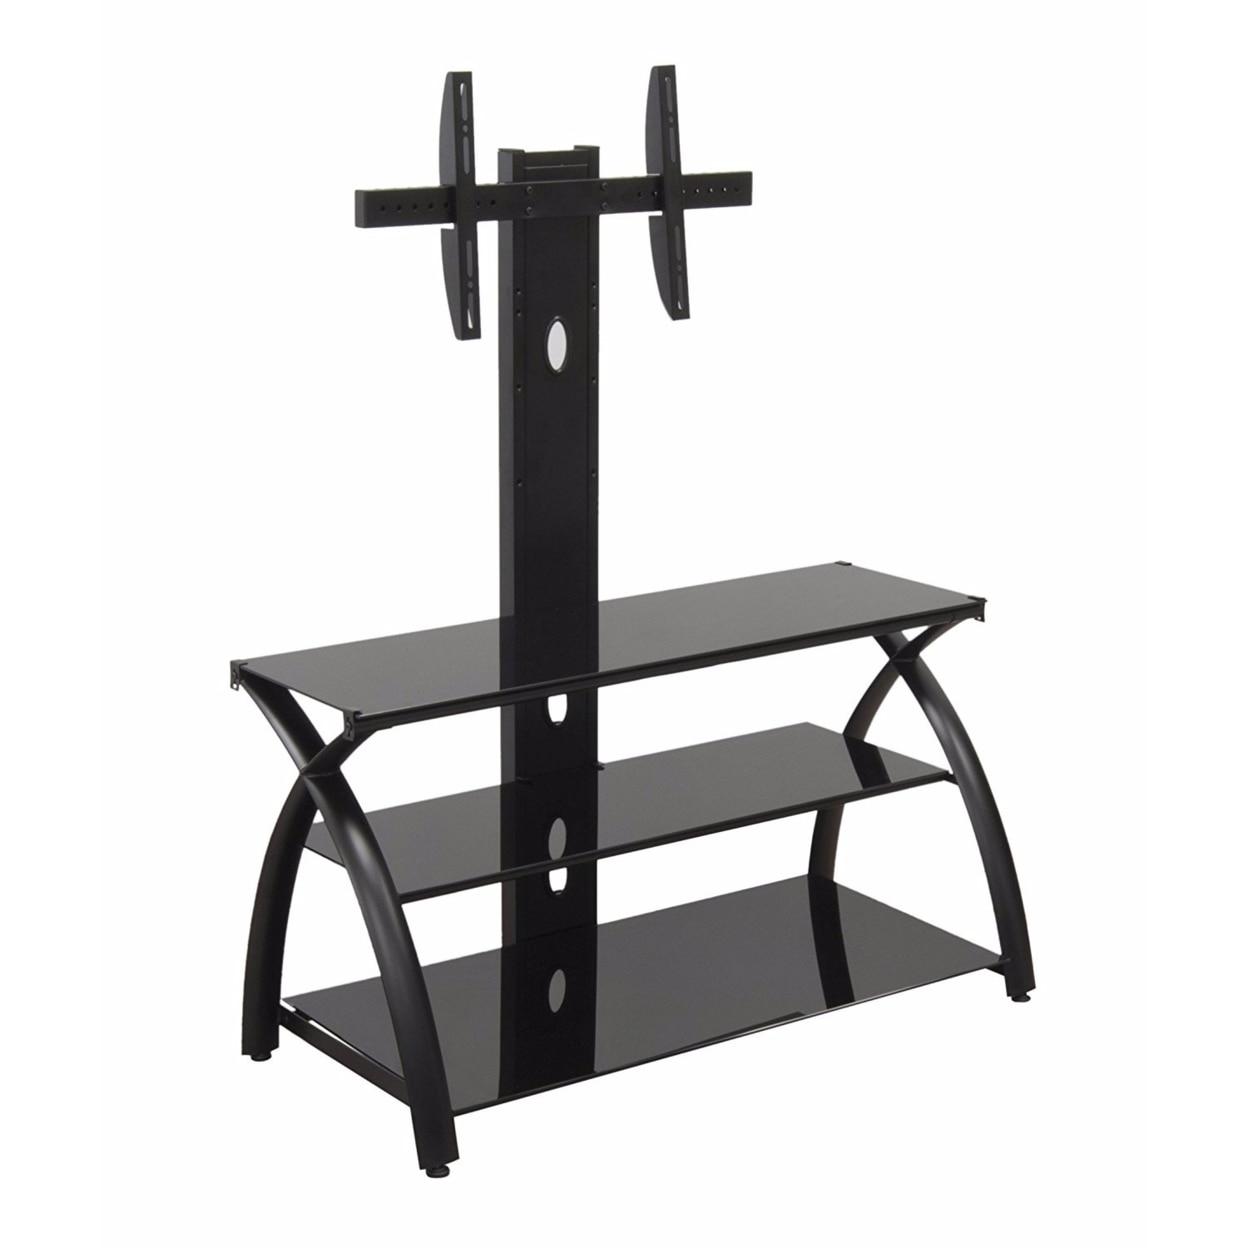 Studio Designs Home Office Futura TV Stand with Tower Glass - Black/Black studio designs home office maxima ii drafting chair black